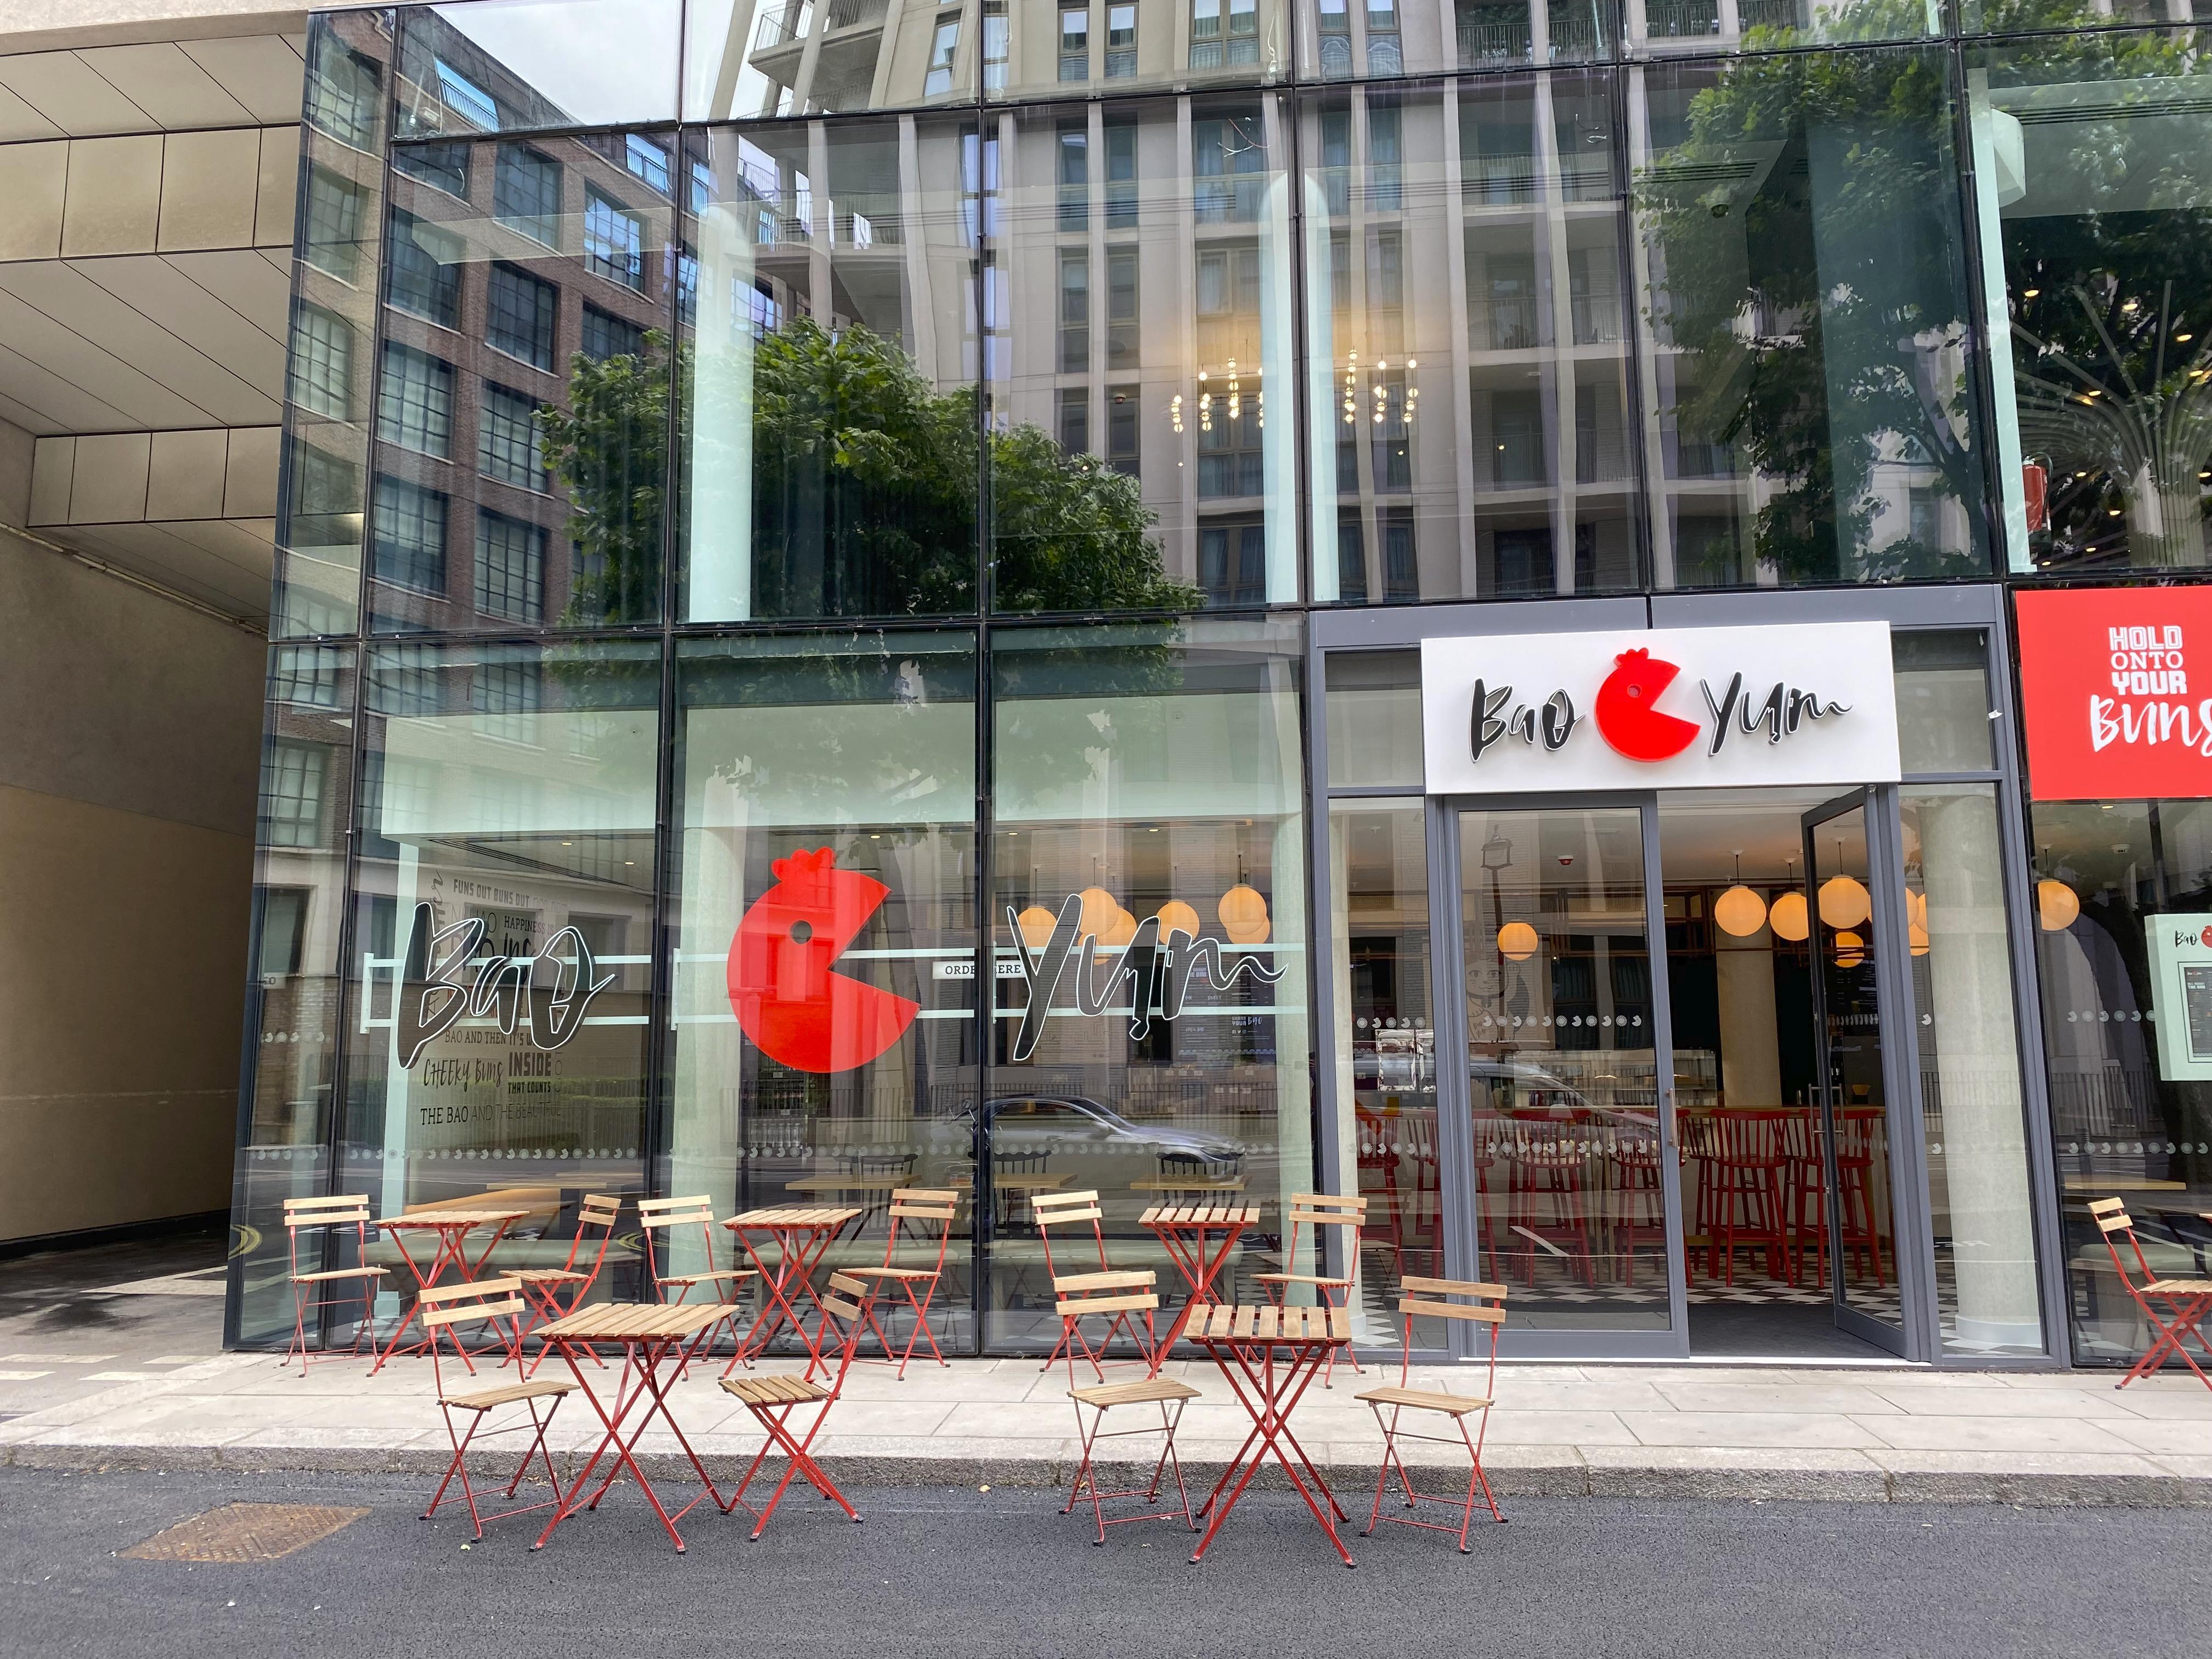 The Westminster London Bao Yum hotel restaurant